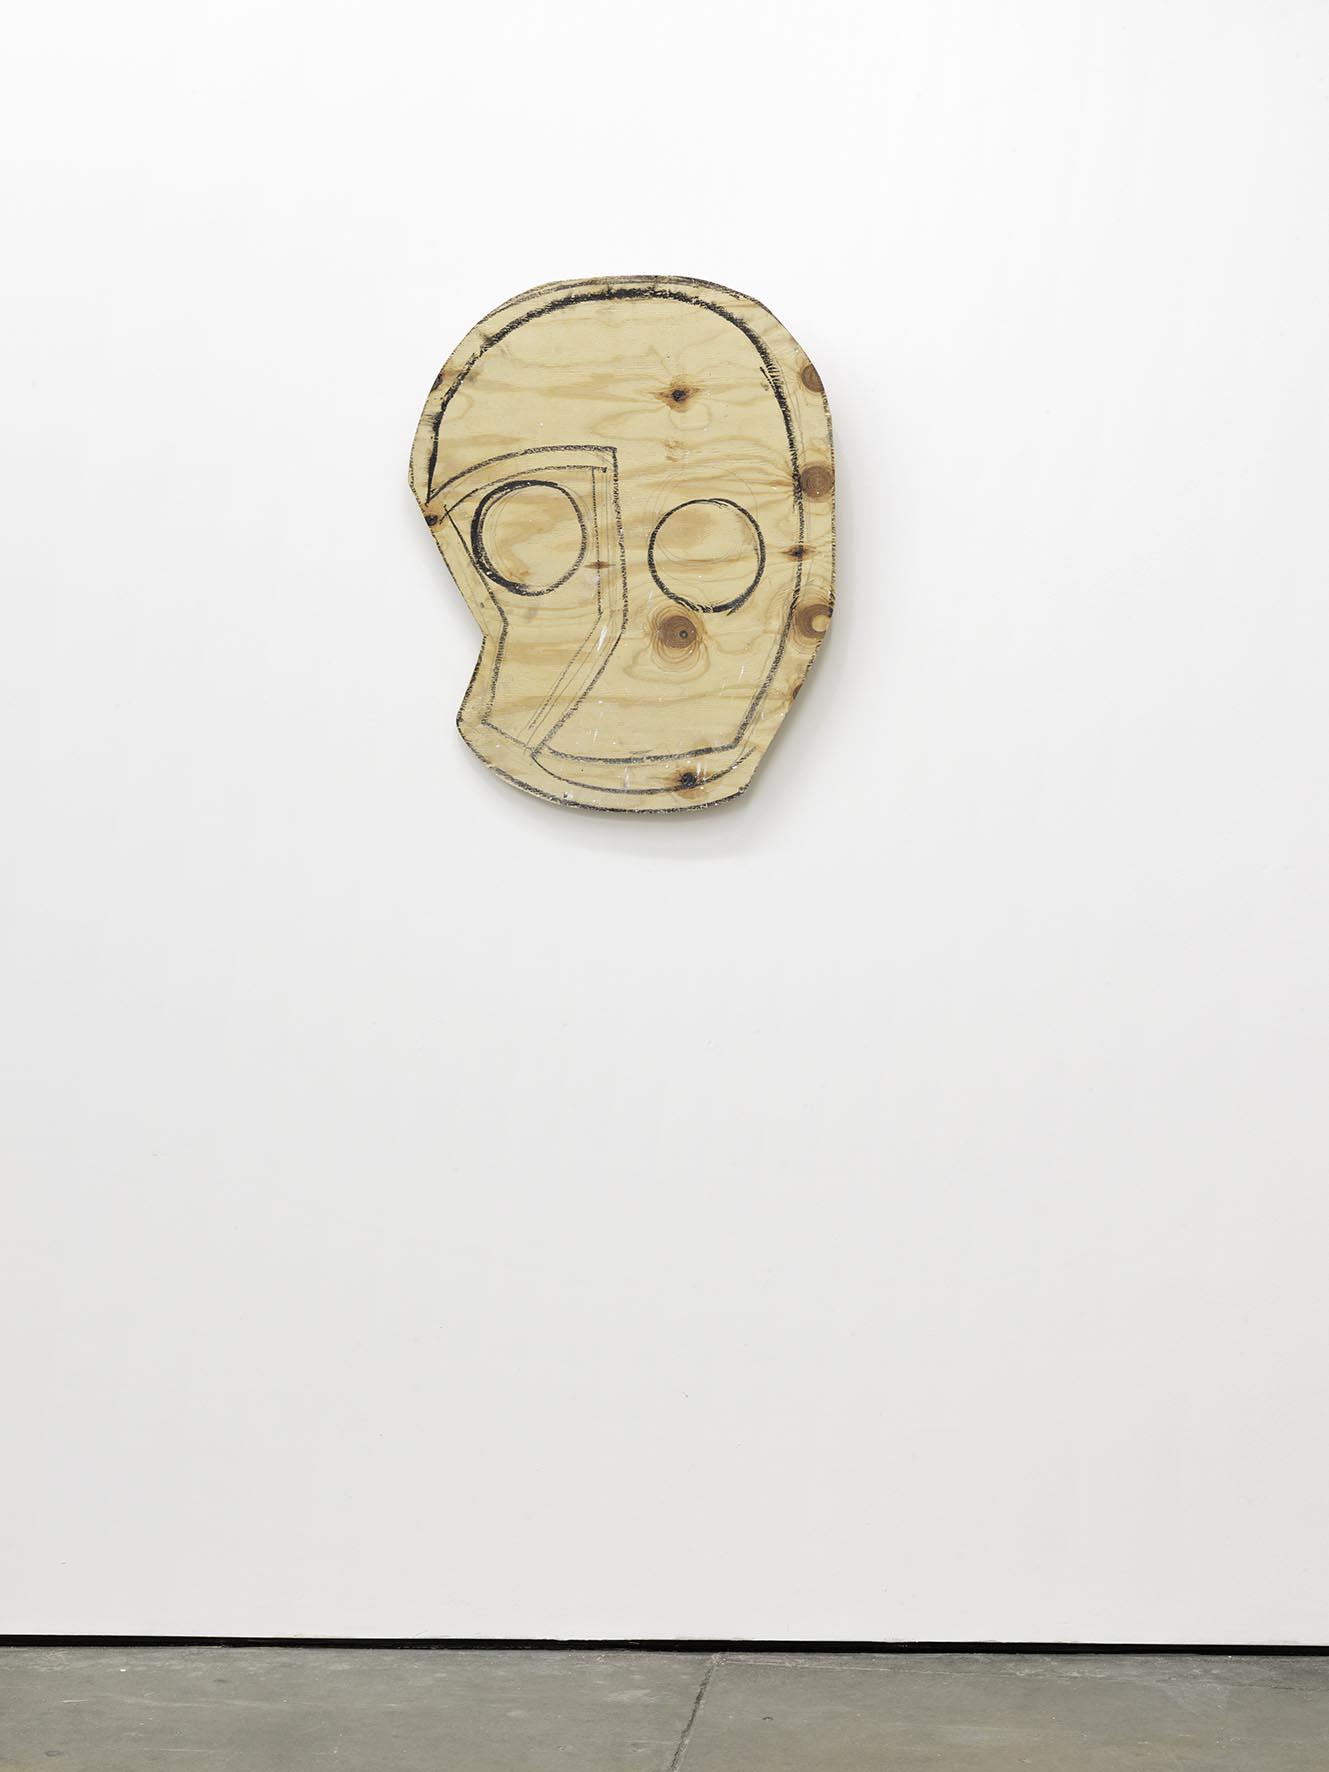 Wood Mask (Owl) 2008 wood, graphite, oil stick 86.4 x 71.1 x 2.5 cm